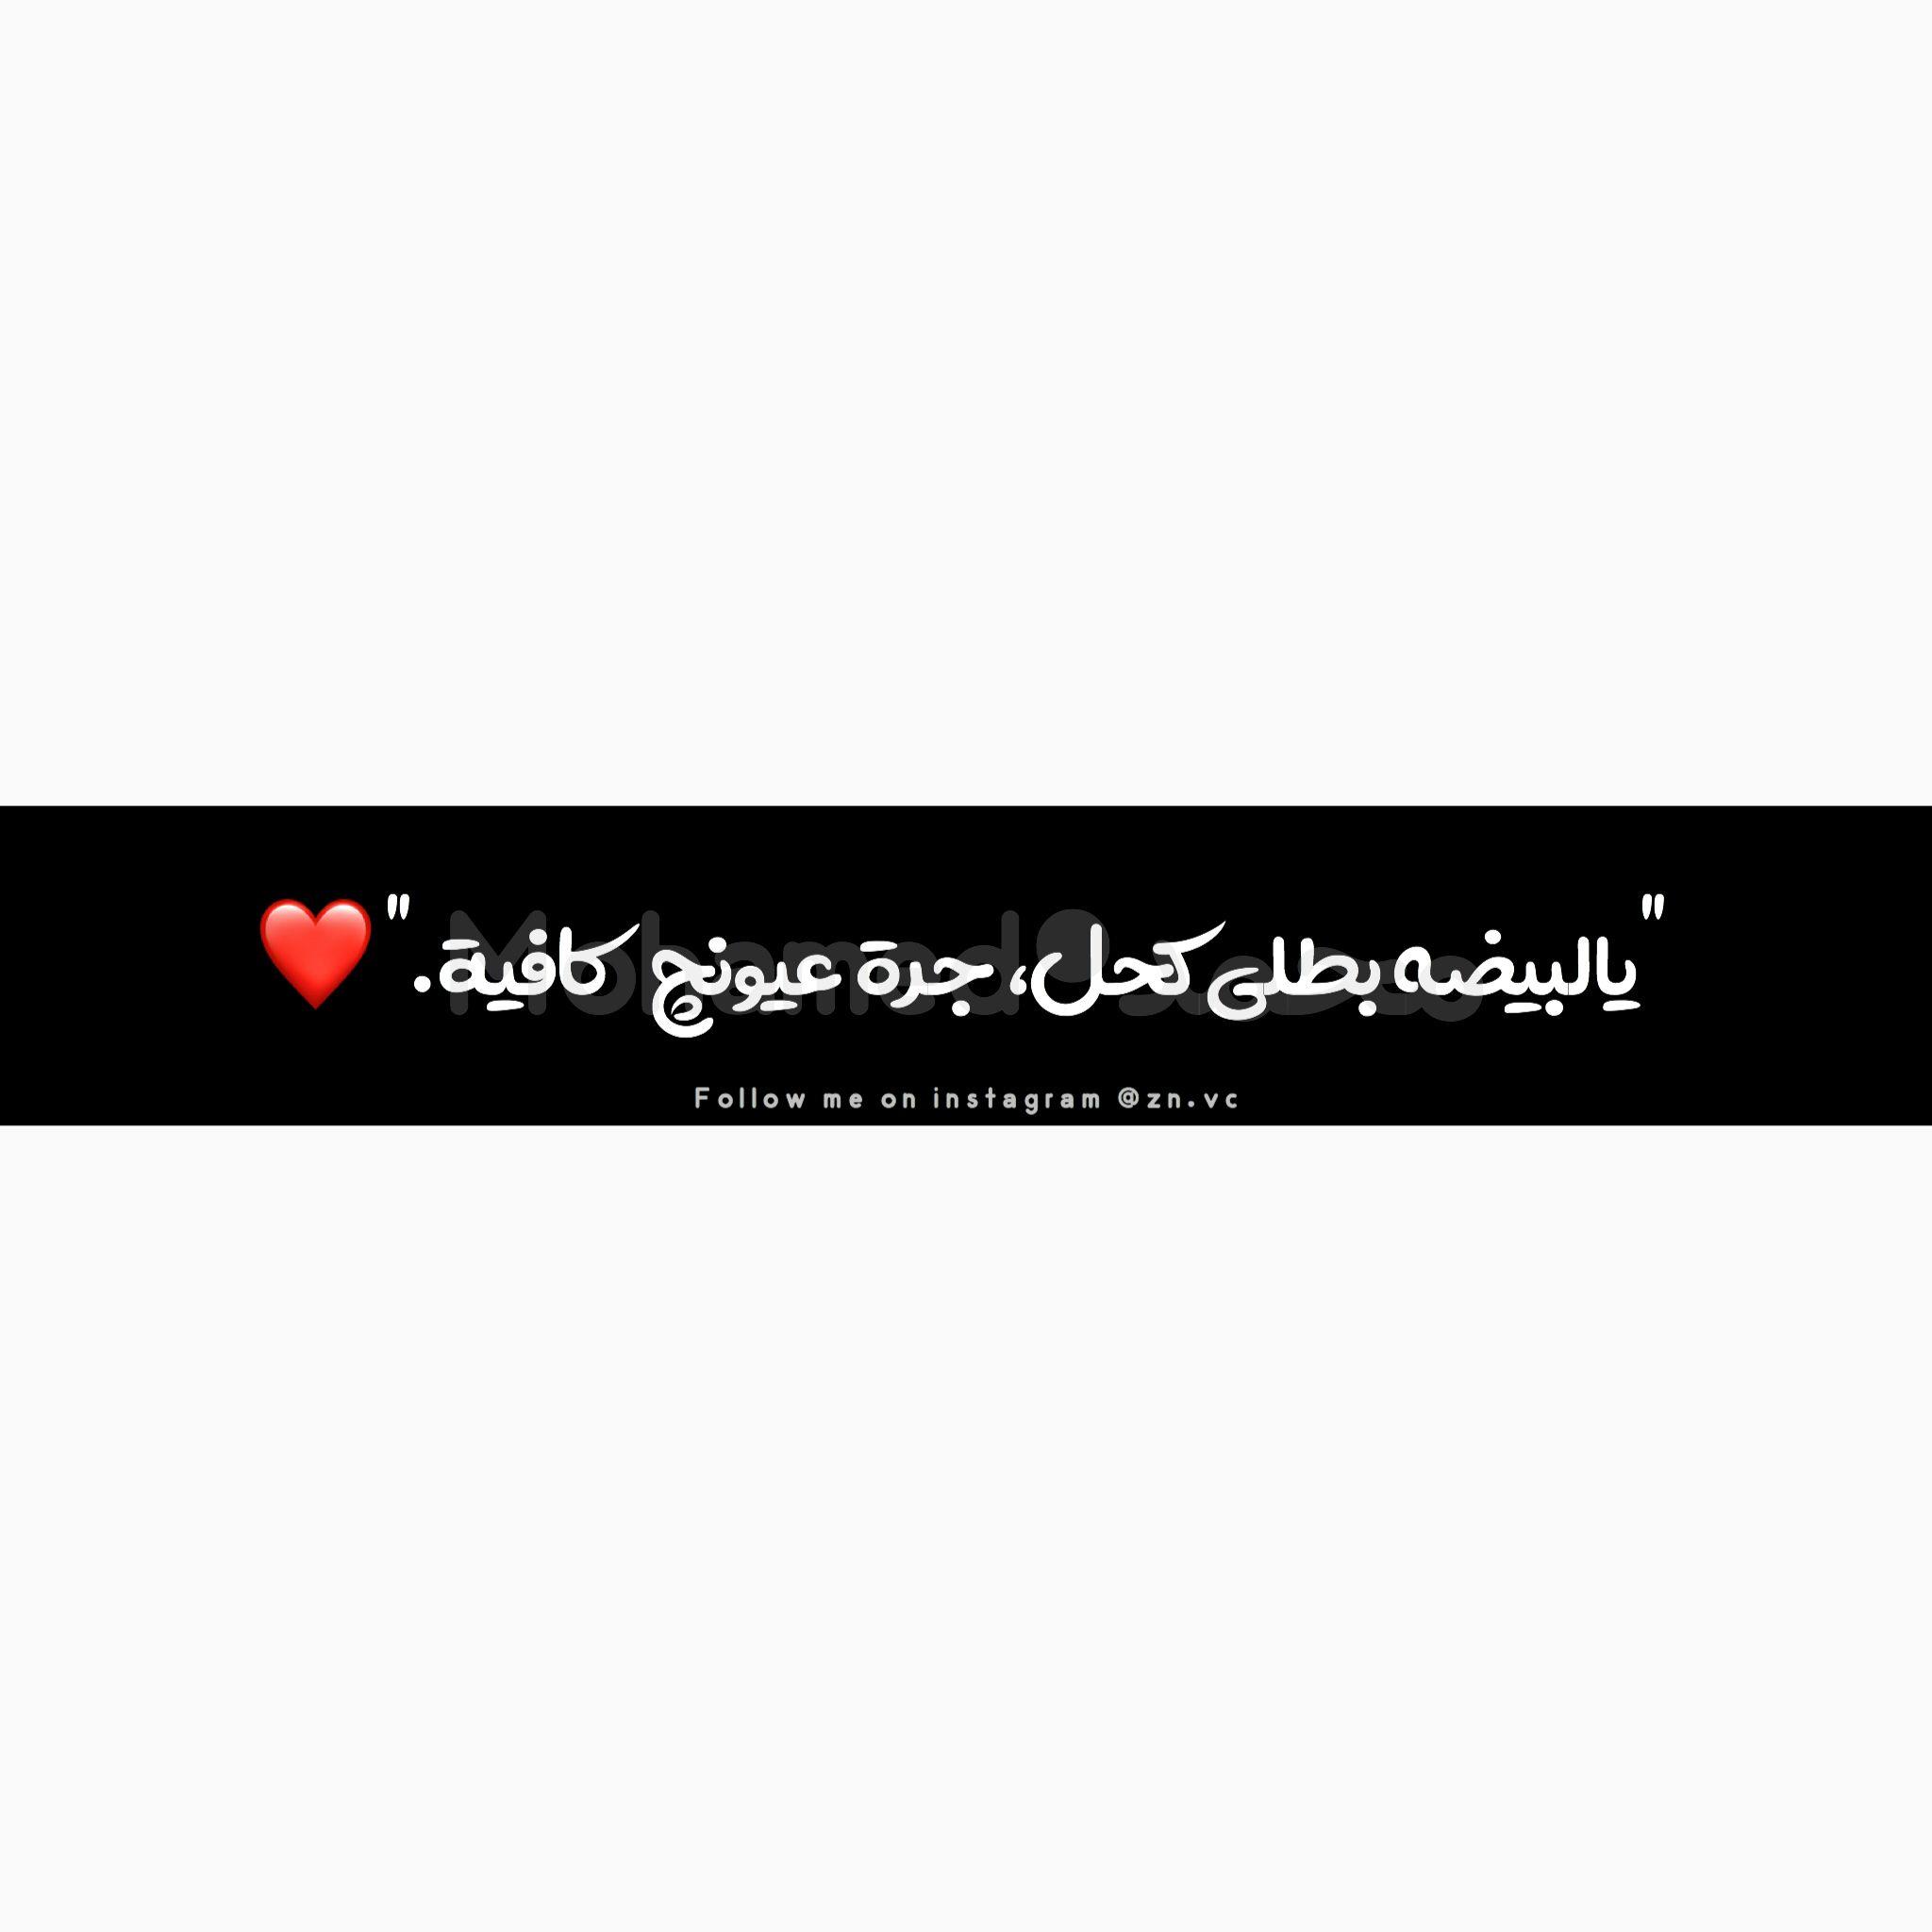 غزل تصاميم محمد حب خواطر شتاء مزاجيات الاكسبلور شعر اقتباسات العراق رم Tech Company Logos Company Logo Follow Me On Instagram